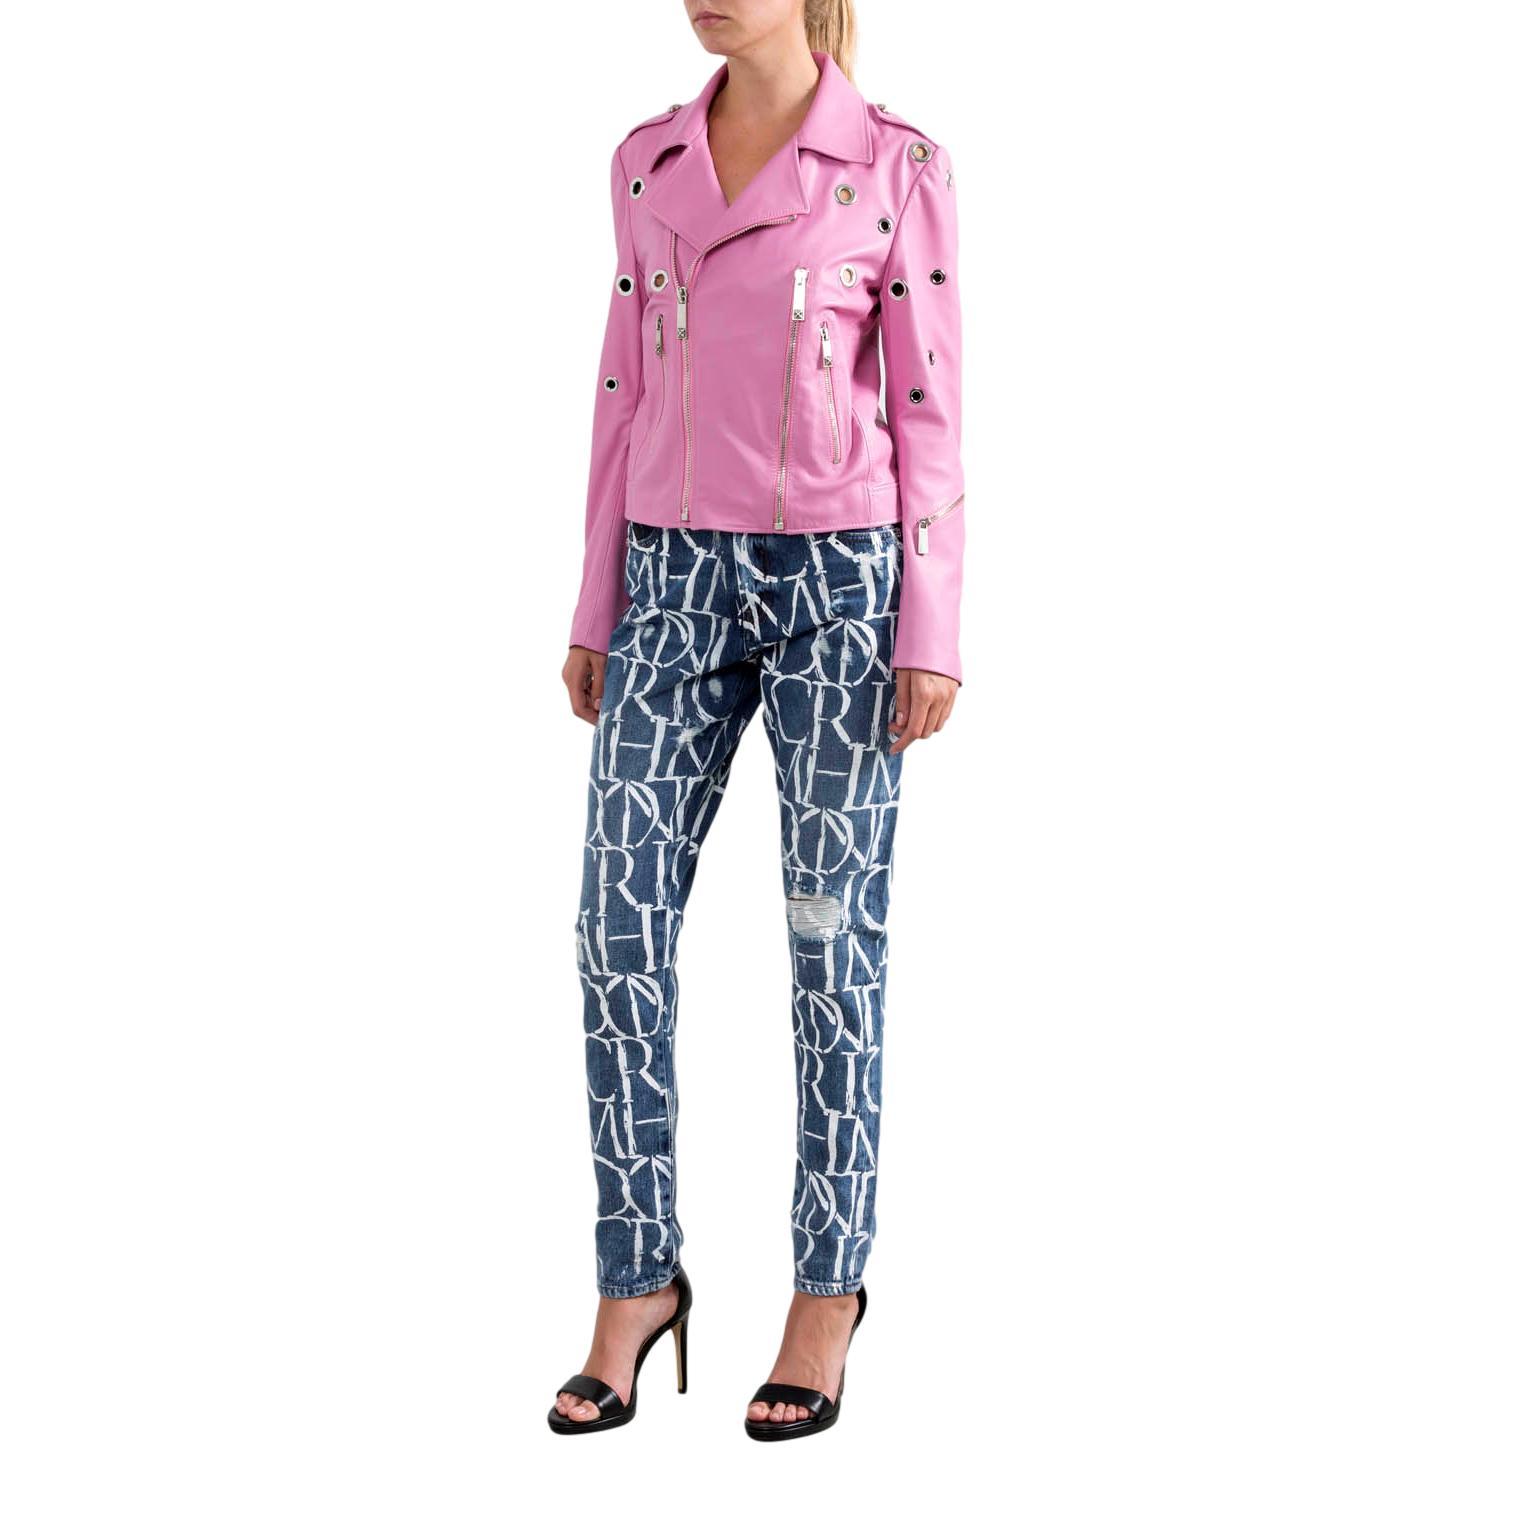 jeans logato RICHMOND JOHN | Jeans | RWP21144JE9GD.OCEAN